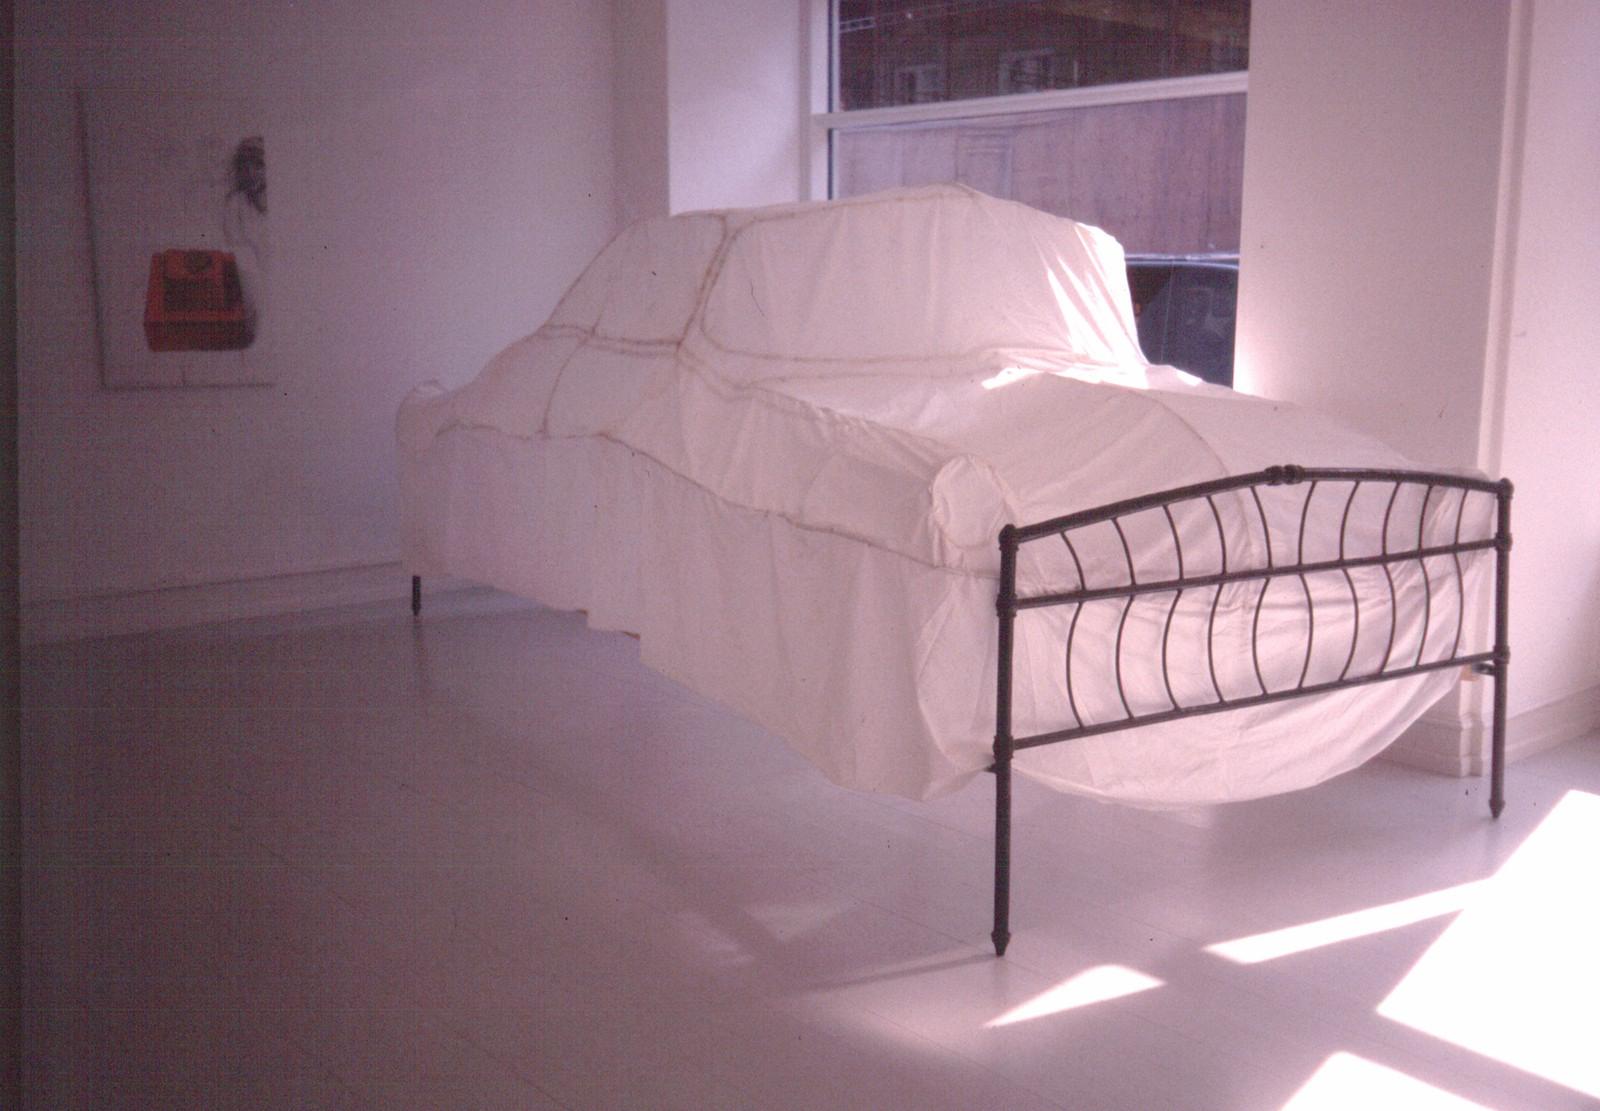 American Dream, 2005, textile, metal, fluorescent lamp, fan, 270 x 150 x 180 cm Installation view Galerie Mikael Andersen, Copenhagen (2005)